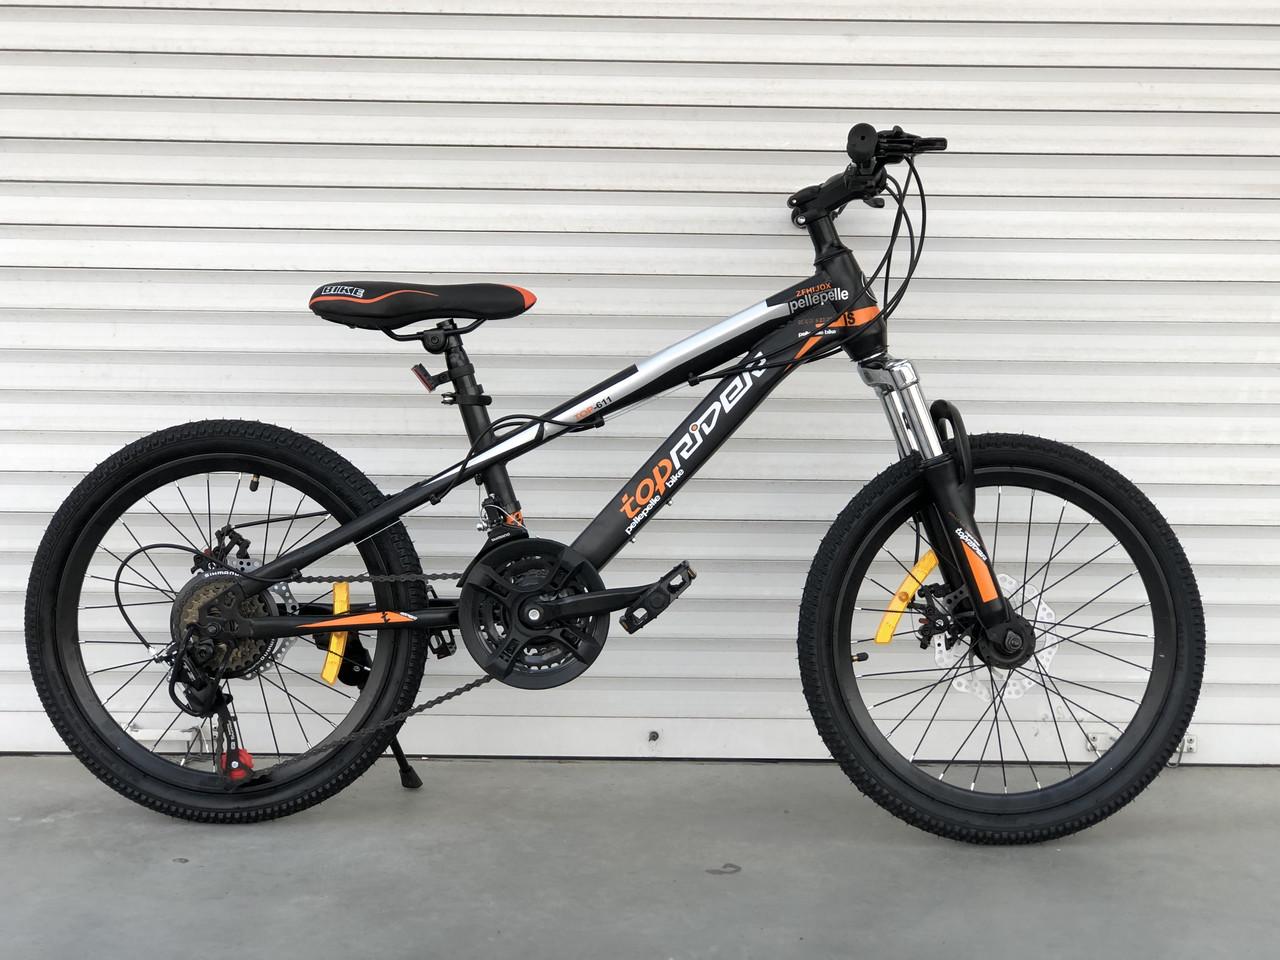 "Спортивний велосипед TopRider 611 колеса 20д / Shimano / рама сталева 13"" / чорно-помаранчевий"